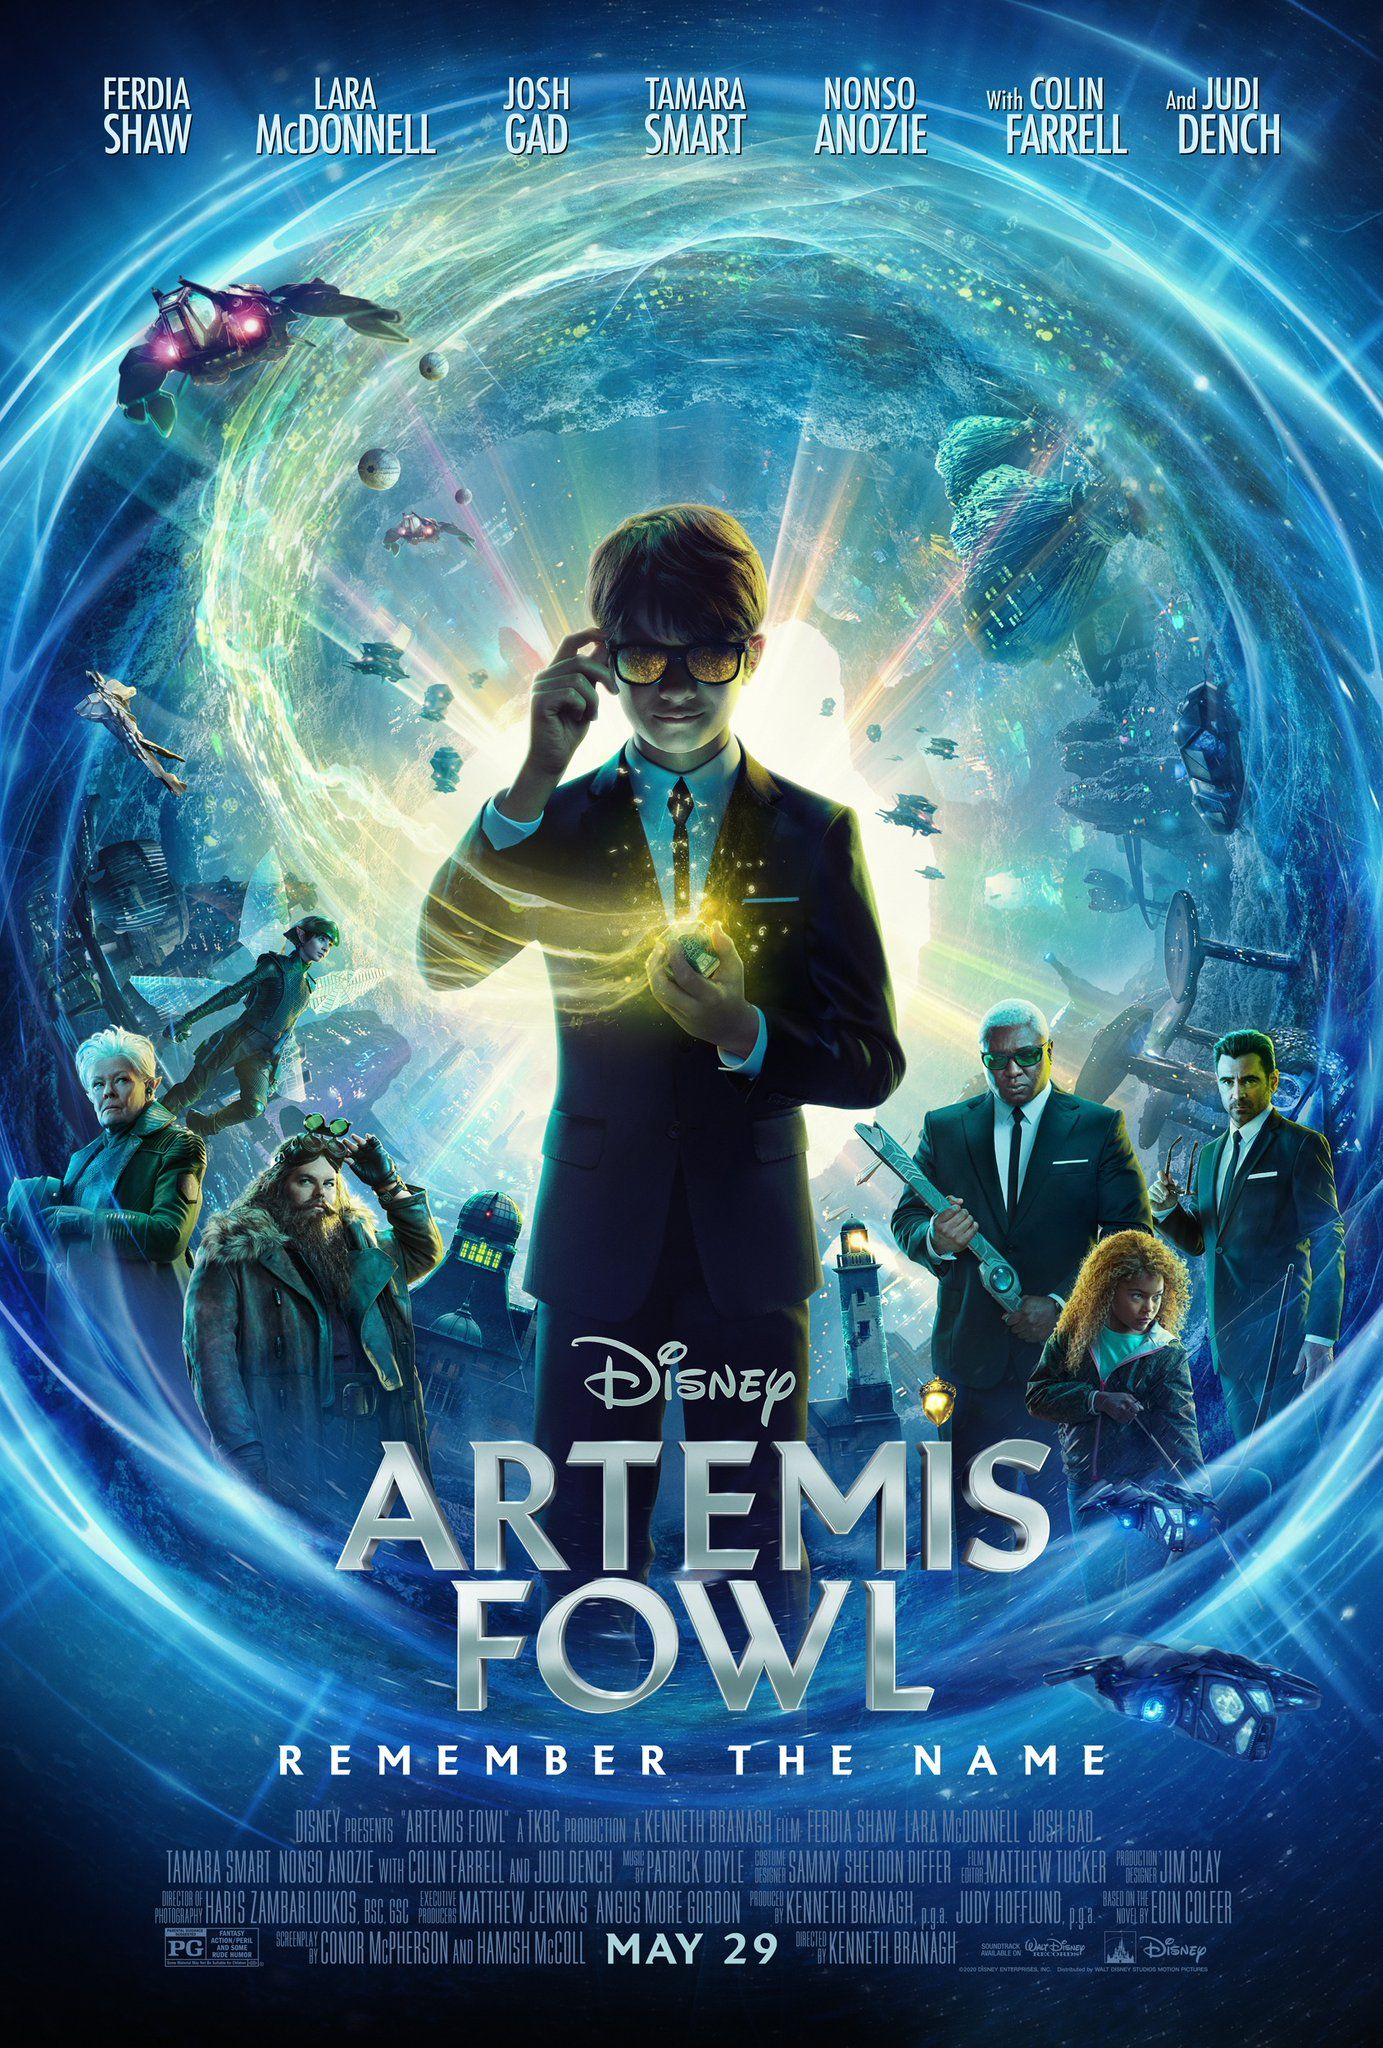 Onward Officila Trailer 2020 New Pixar Anuimation Movie Hd Youtube Pixar Animated Movies Animation Movie Pixar